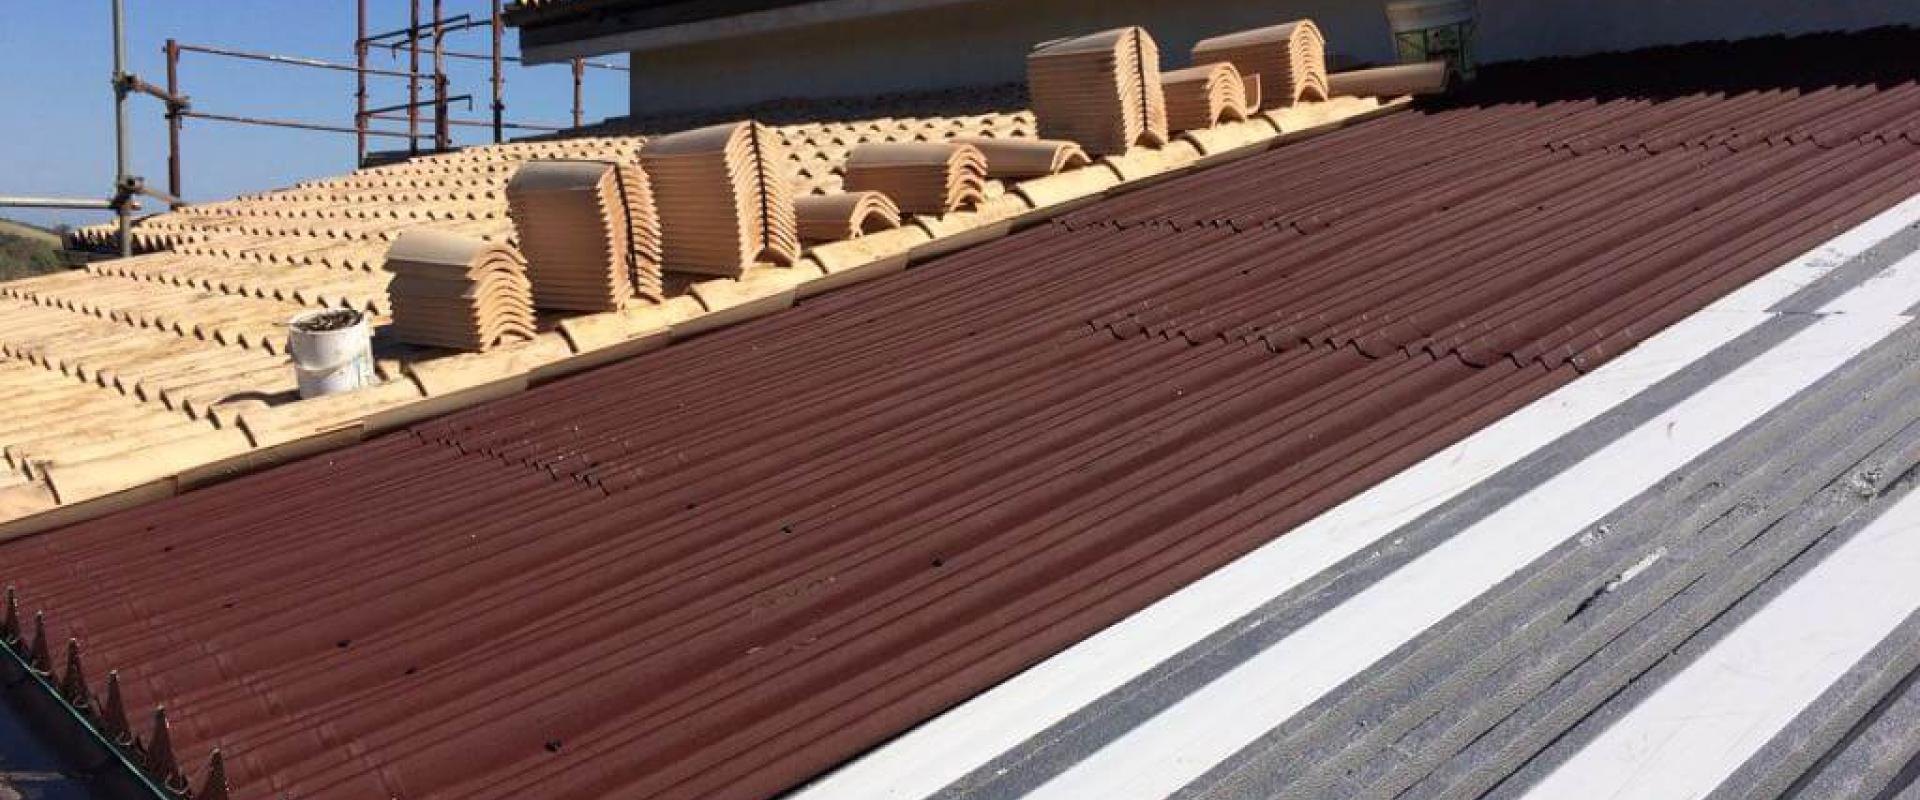 Solaio Laterocemento Anni 50 onduline roofing system premium rs   onduline